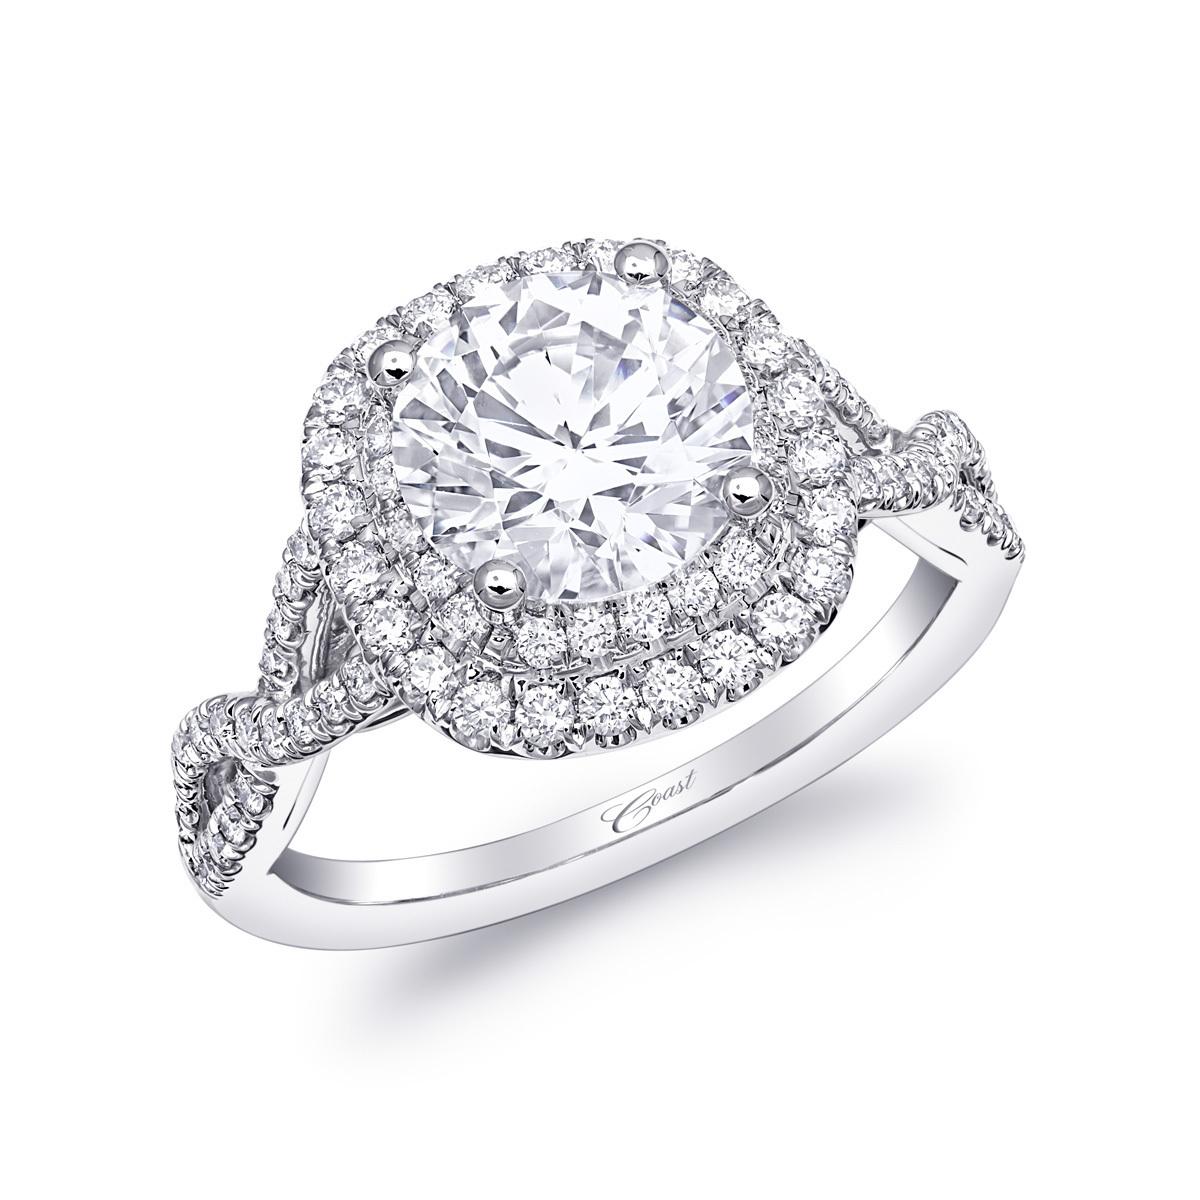 Charisma Engagement Ring - Double Halo Twist Shank